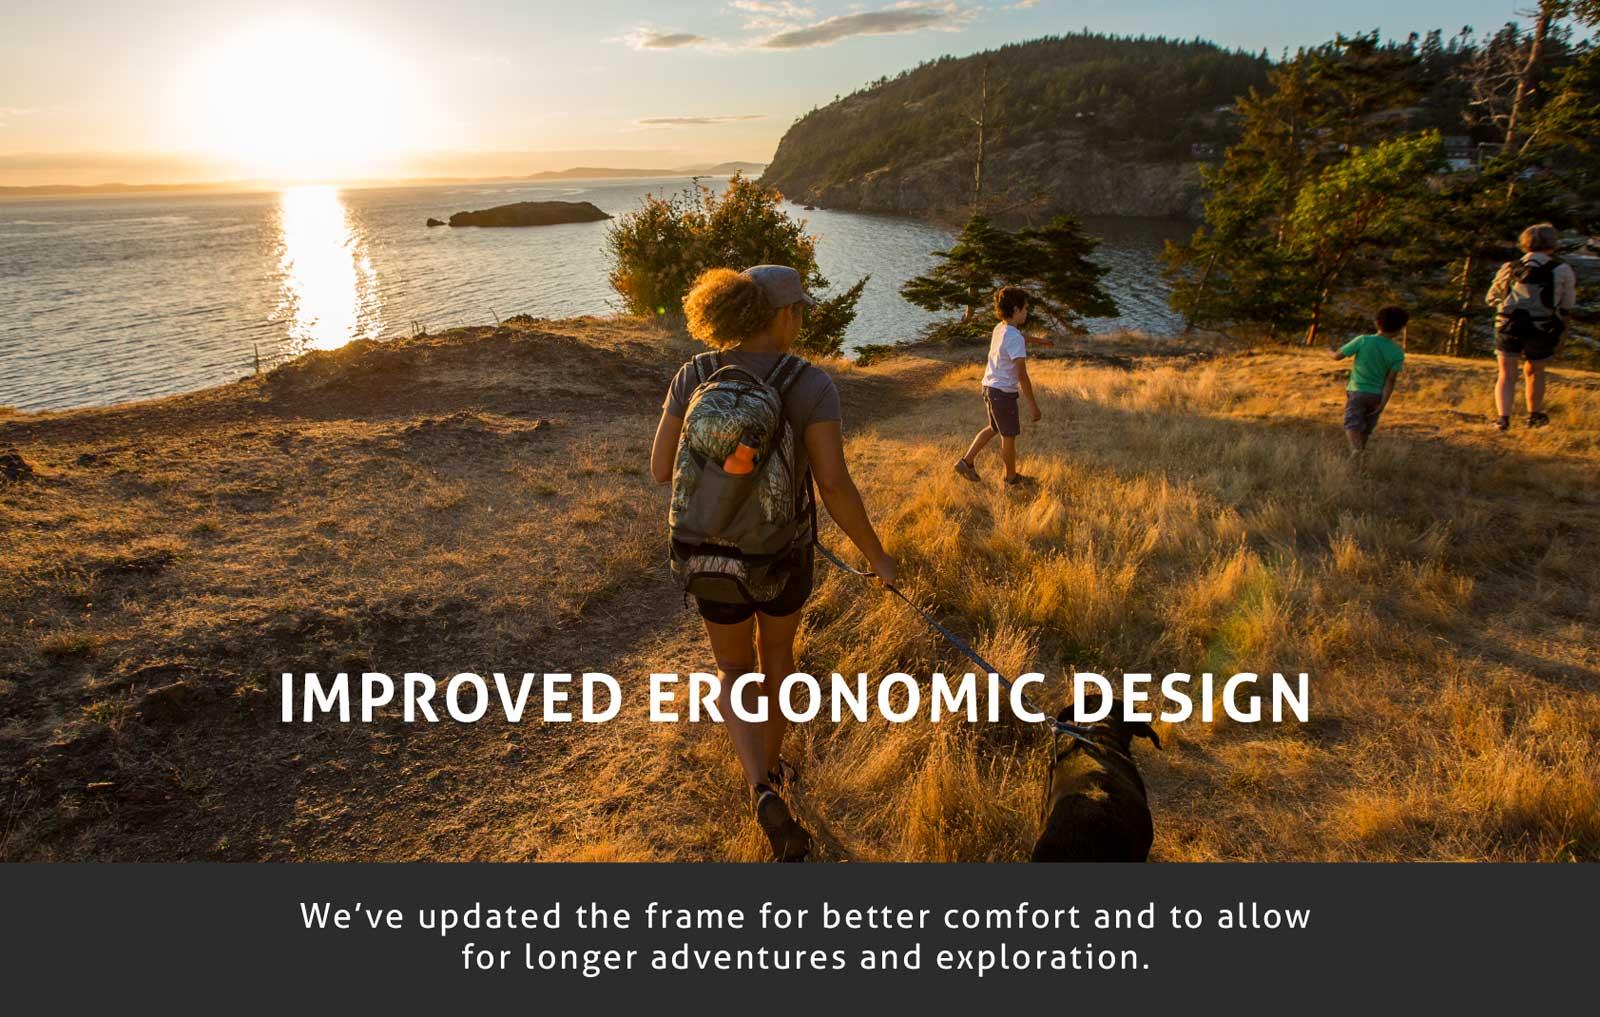 Hiking with Kids Ergonomic Design Bacpack